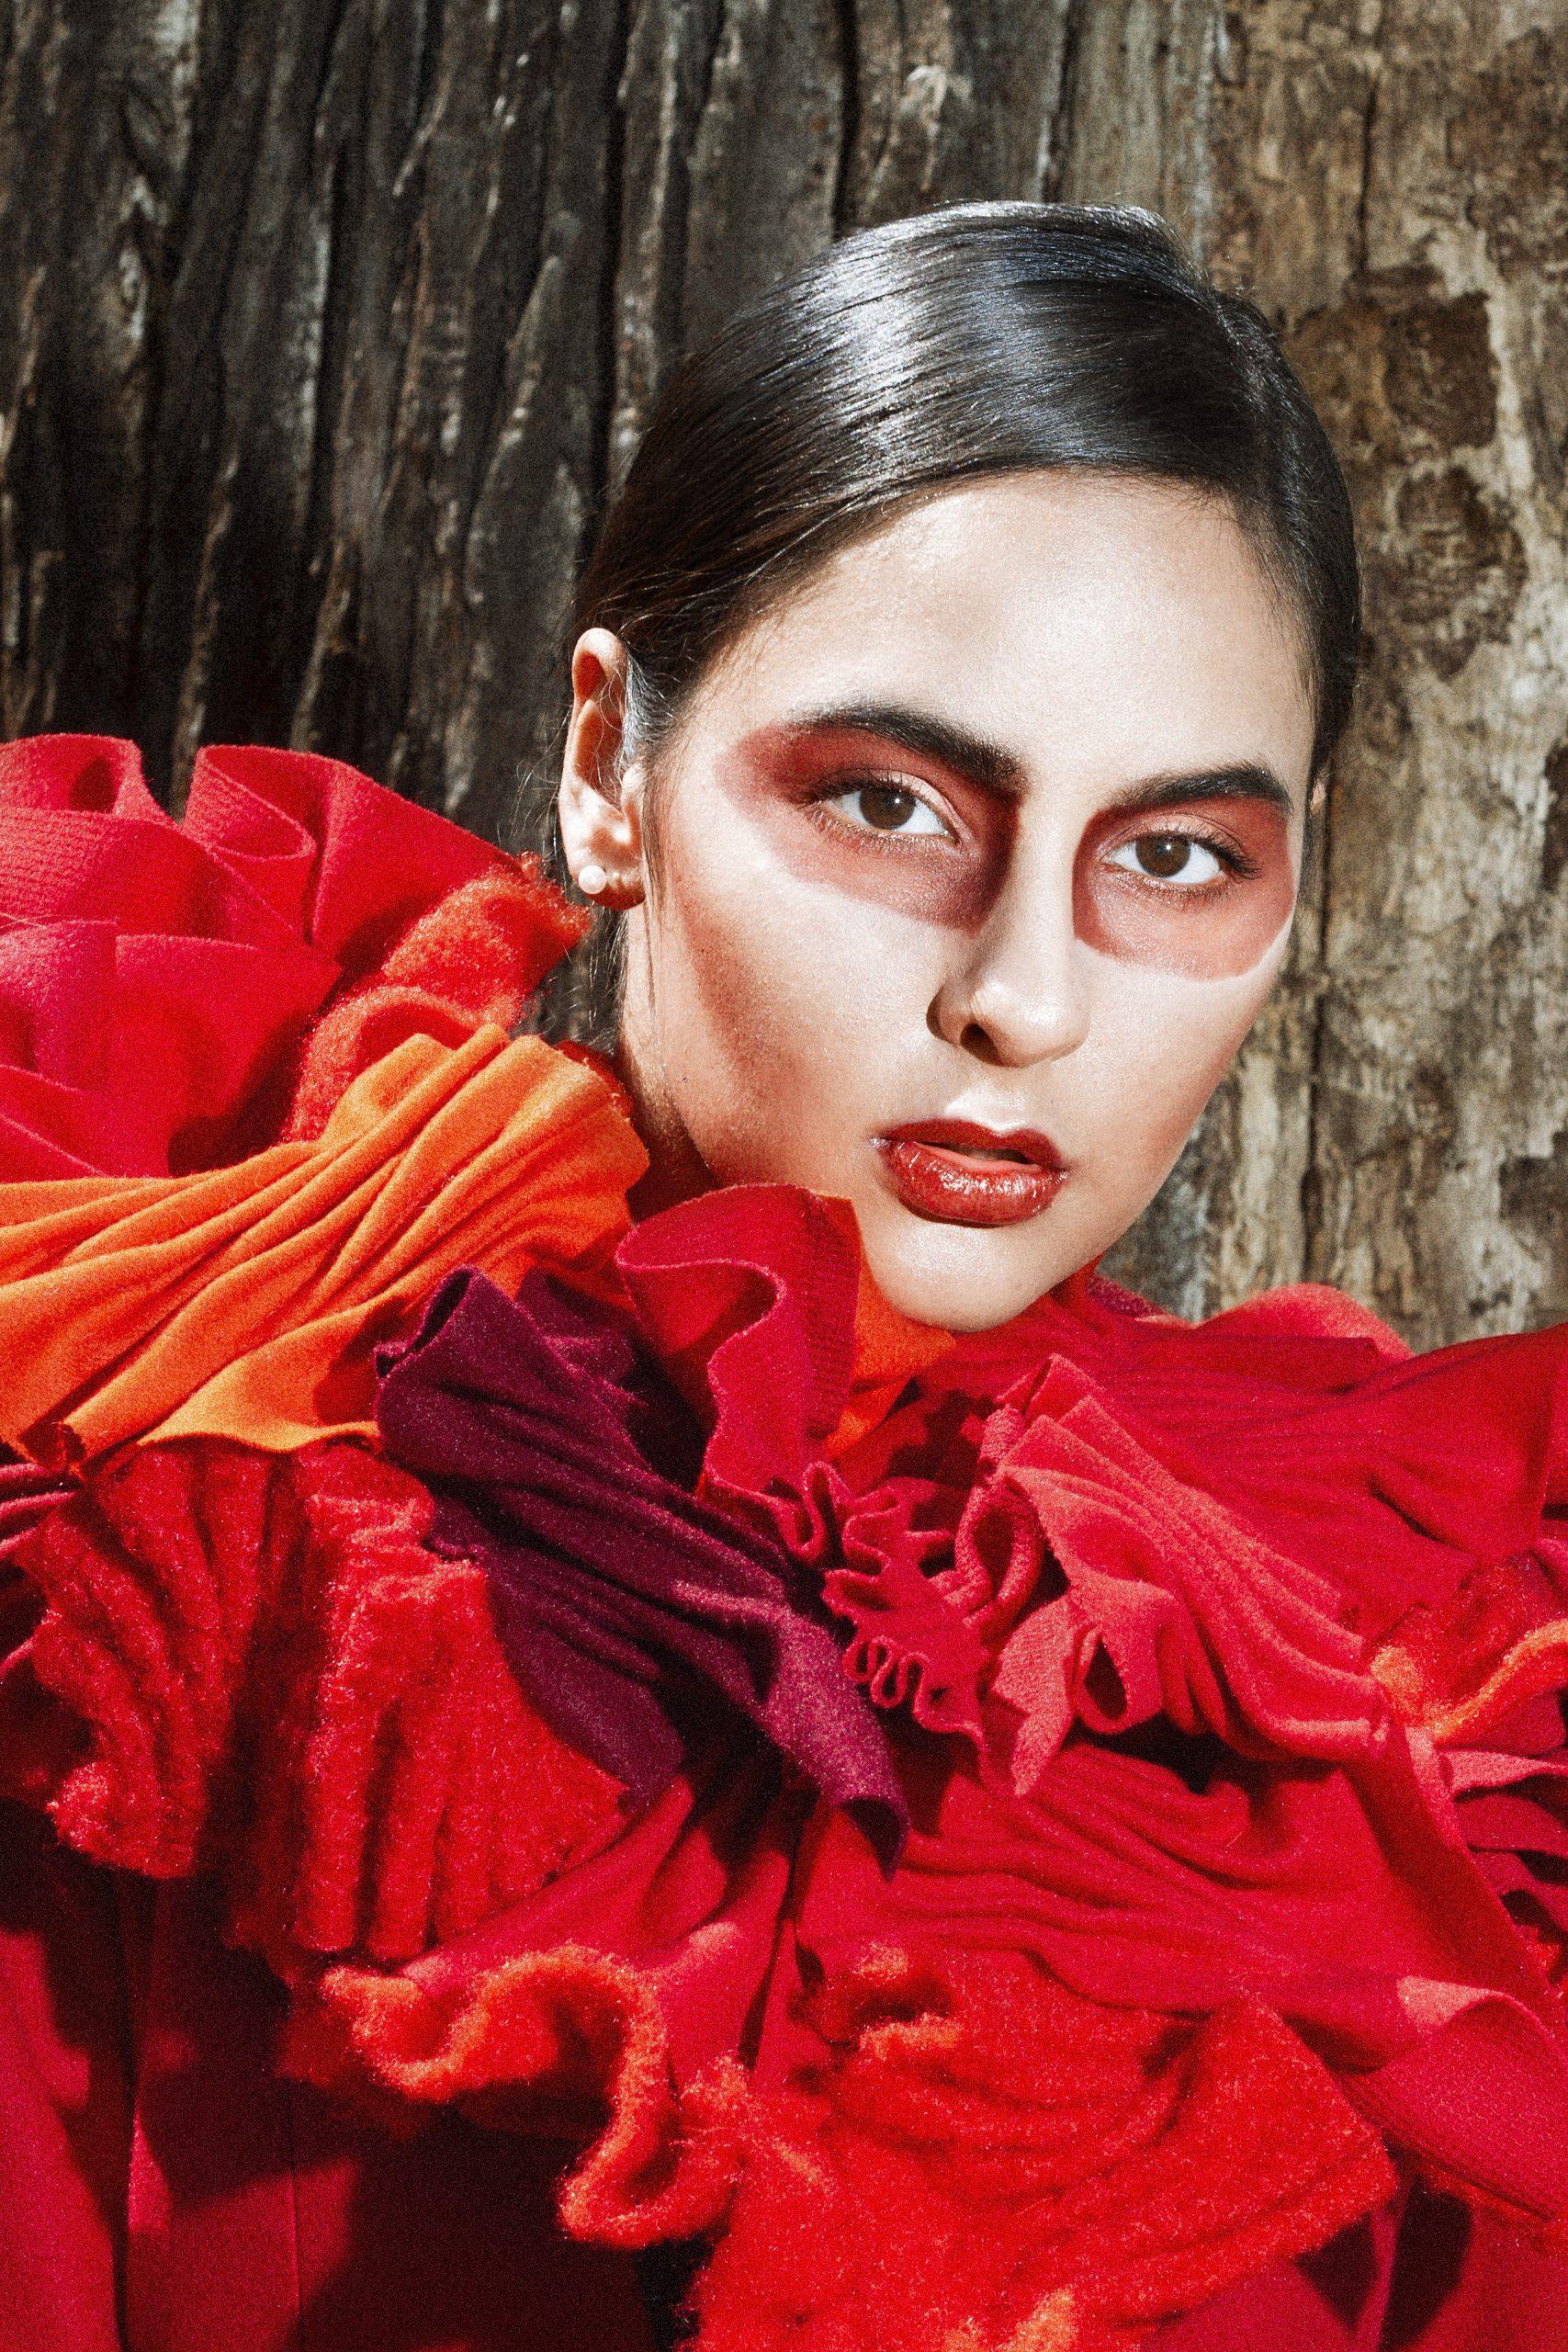 Fashionshoot Assuré magazine